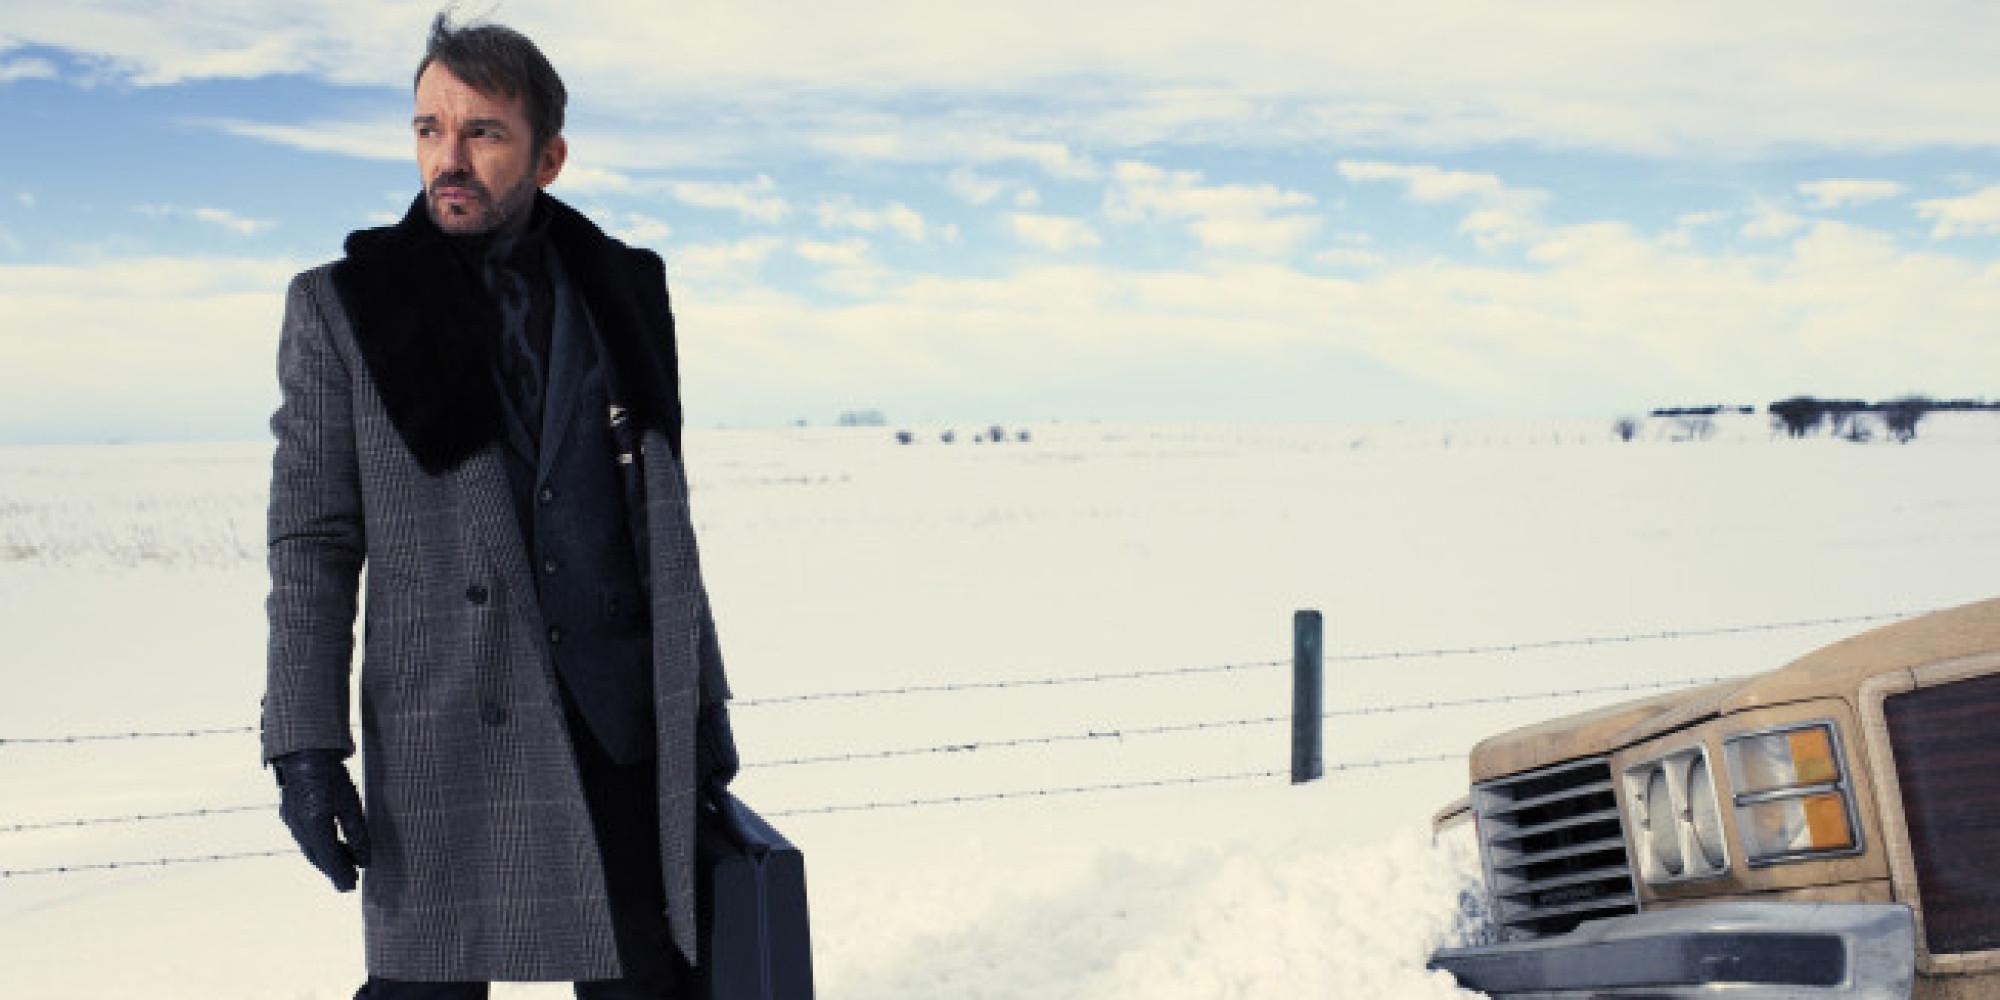 Meet The Cast Of FX's New 'Fargo' Series | HuffPost